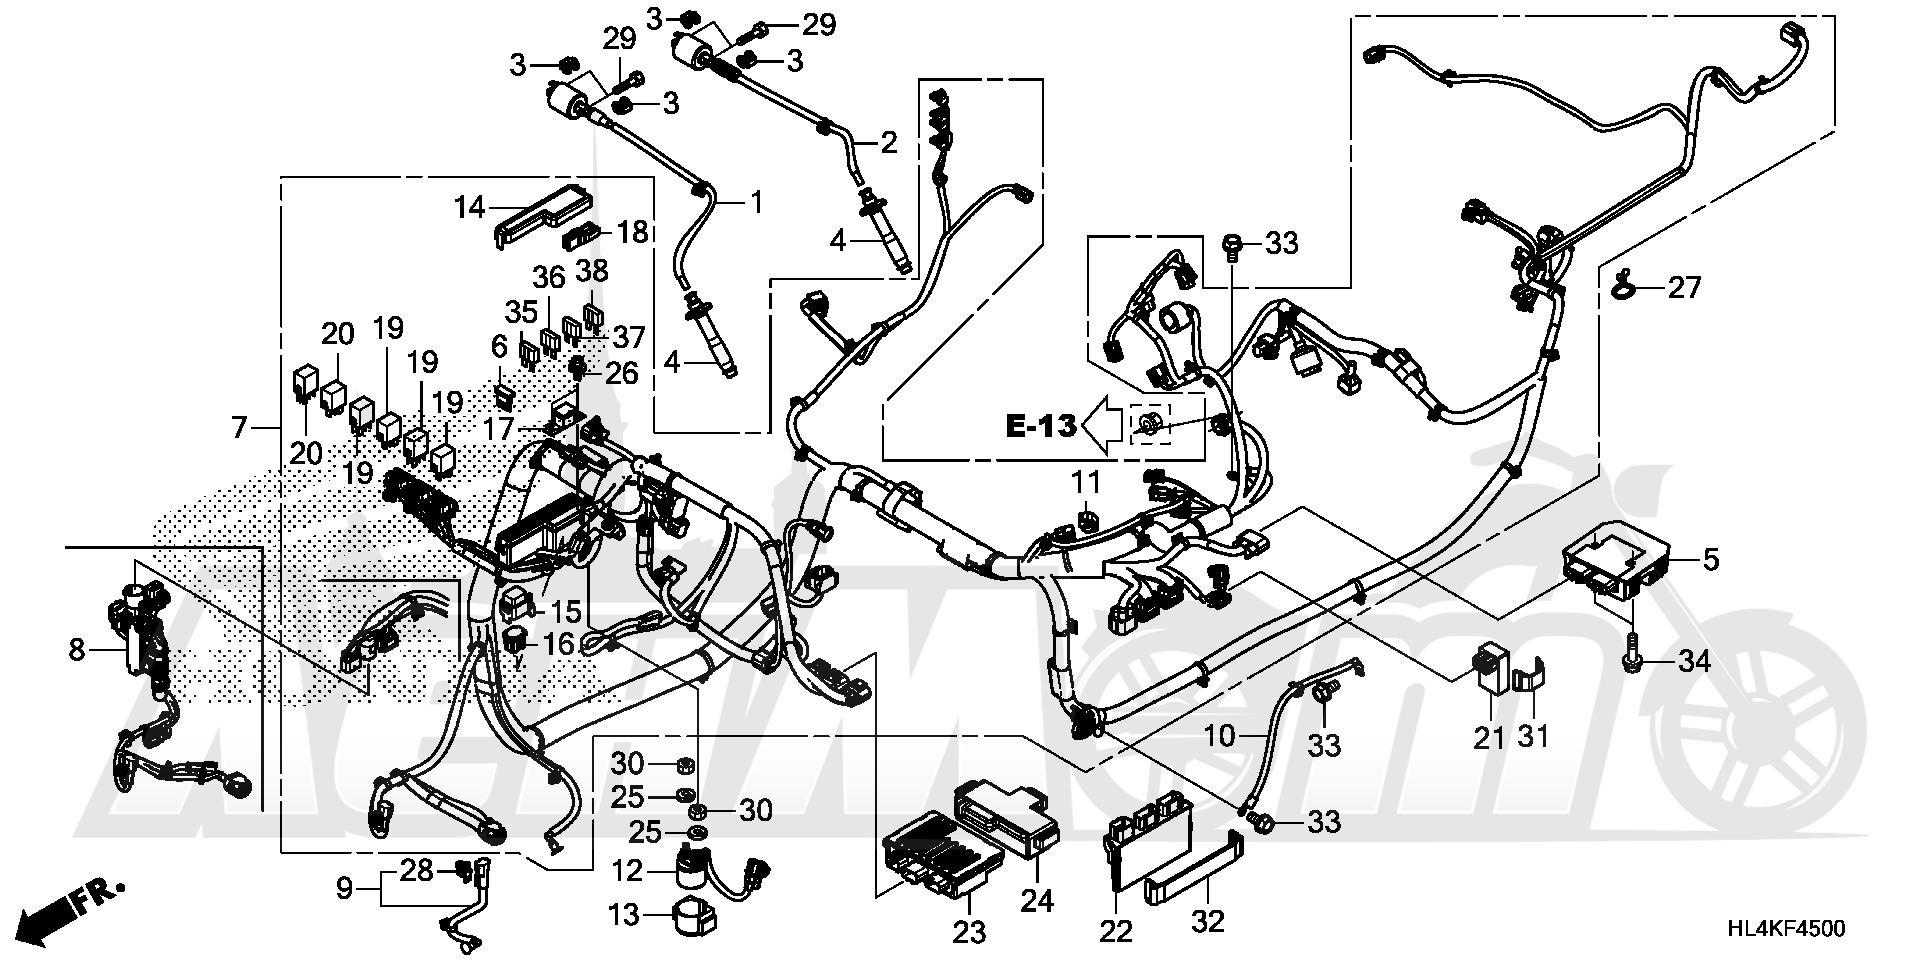 Запчасти для Квадроцикла Honda 2019 SXS1000M3L Раздел: WIRE HARNESS | жгут проводов